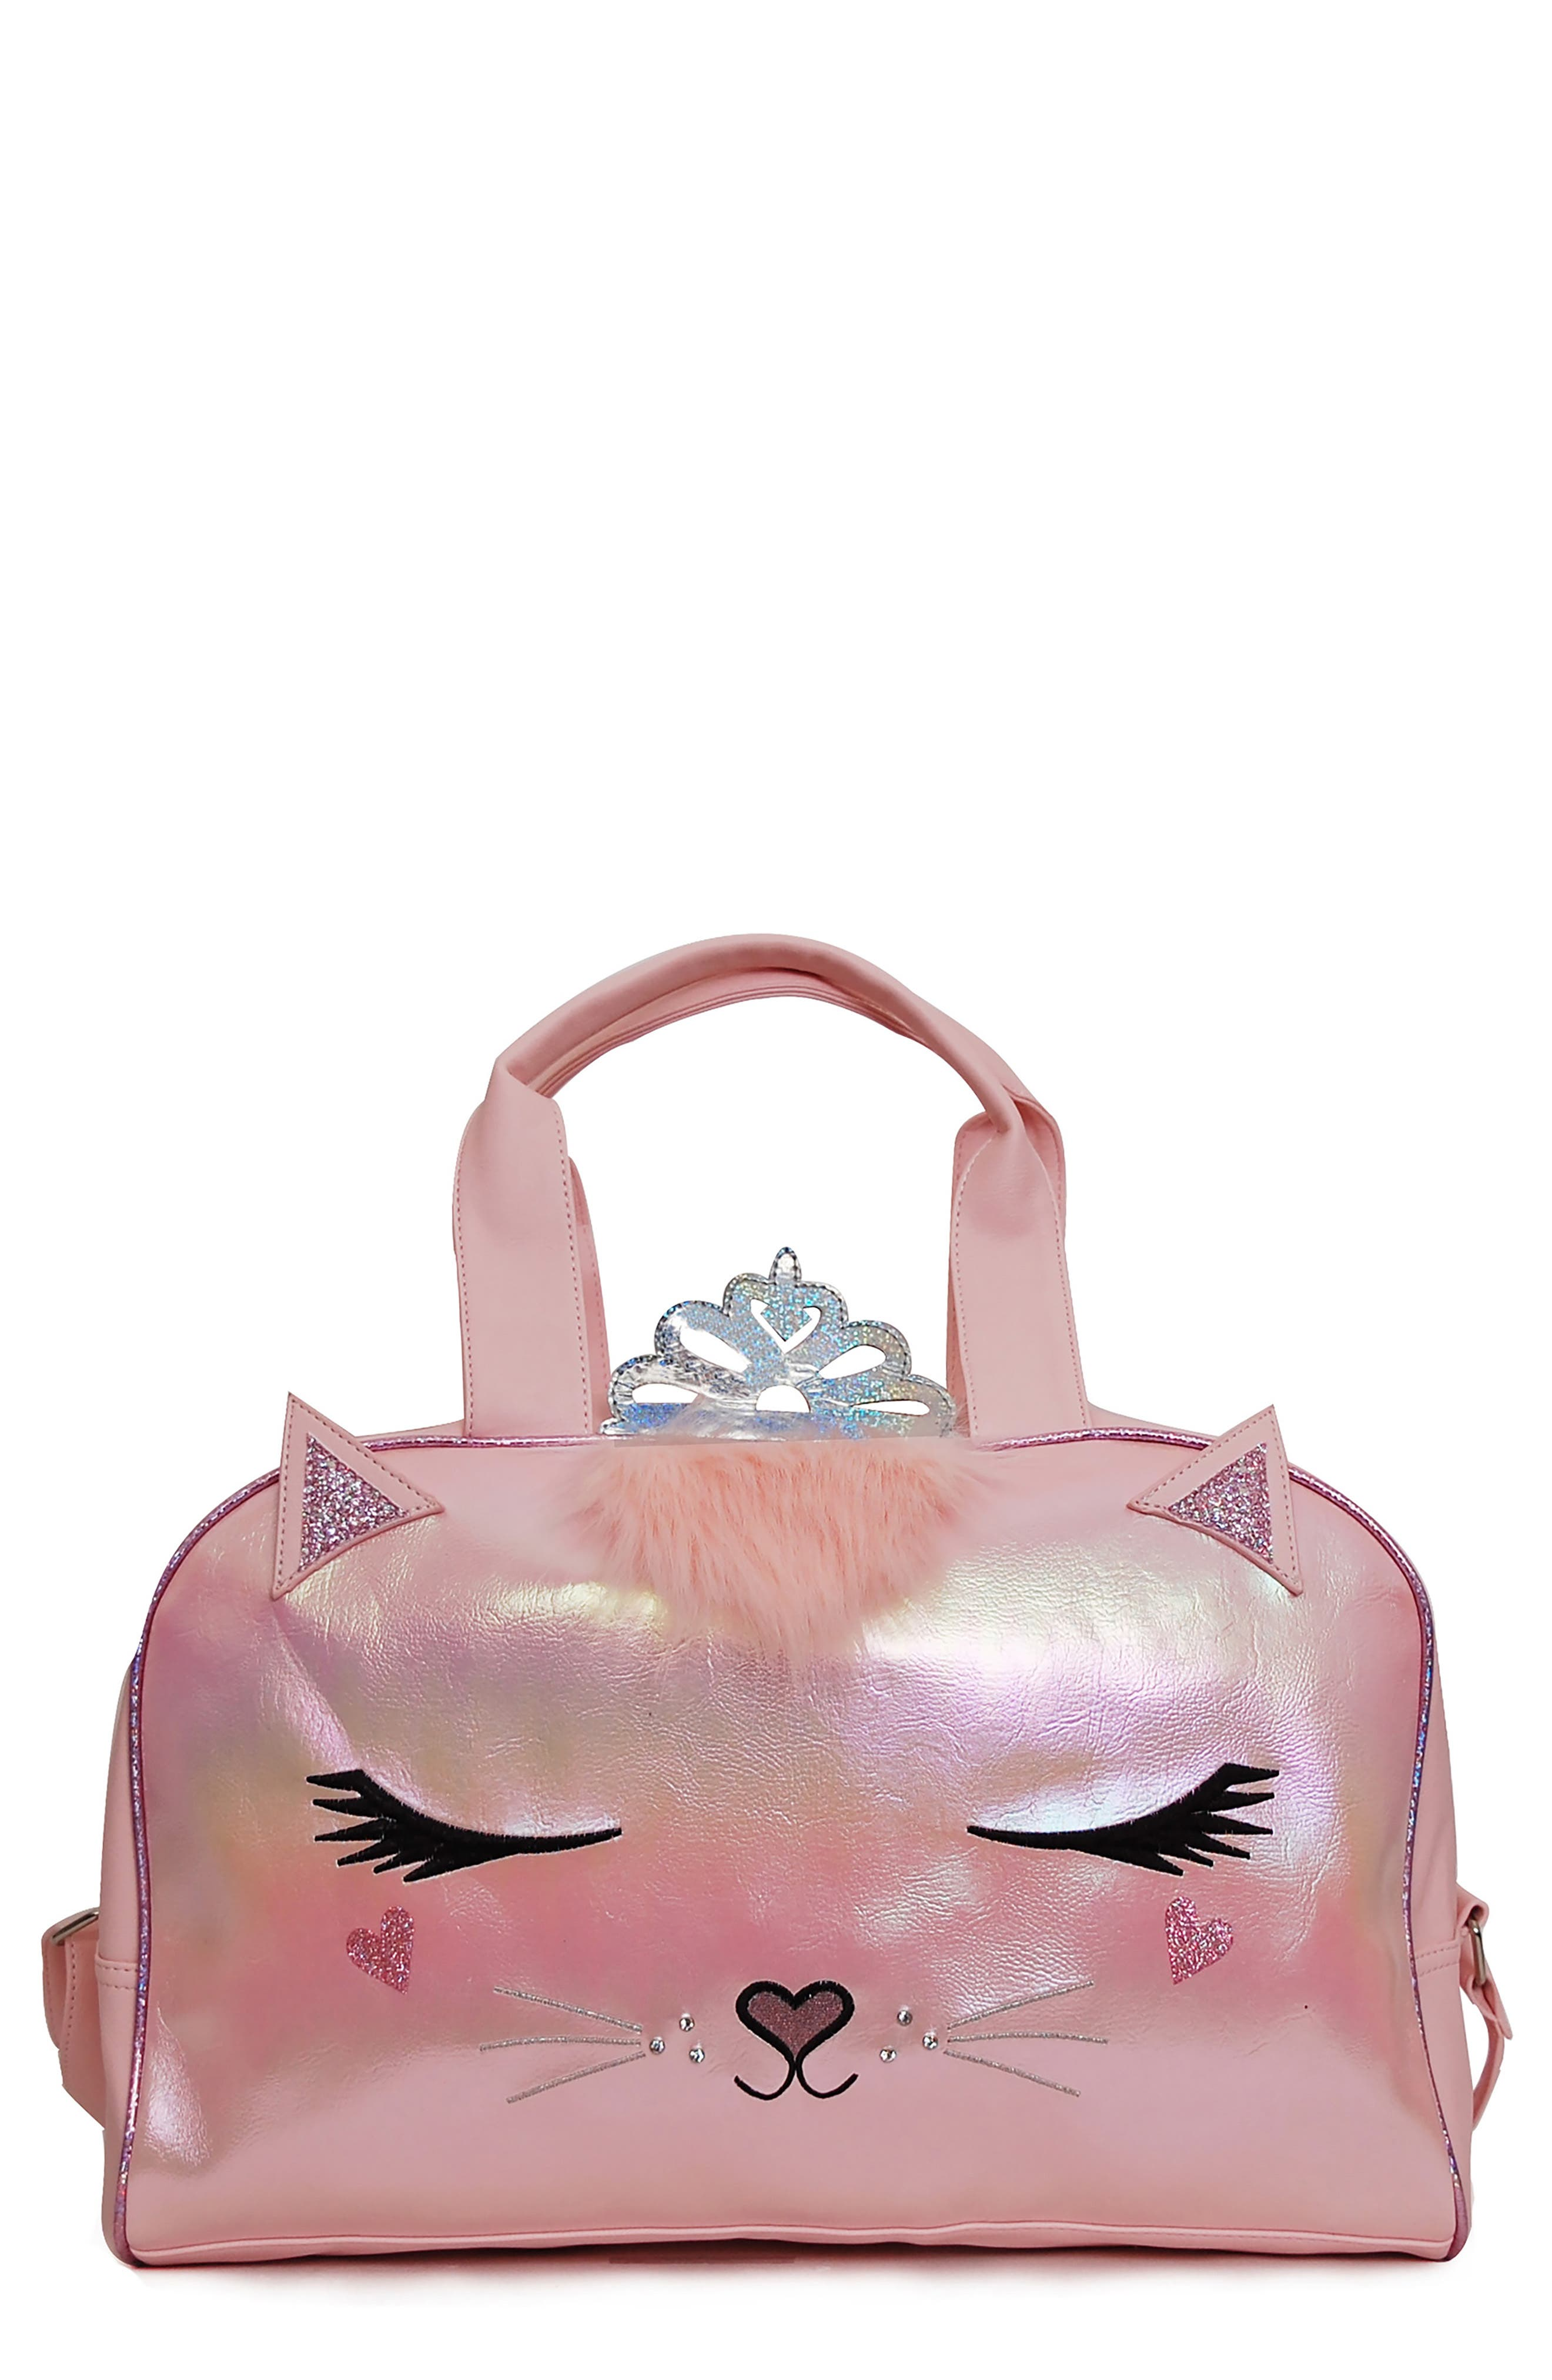 Image of OMG! Accessories Princess Bella Kitty Duffle Bag